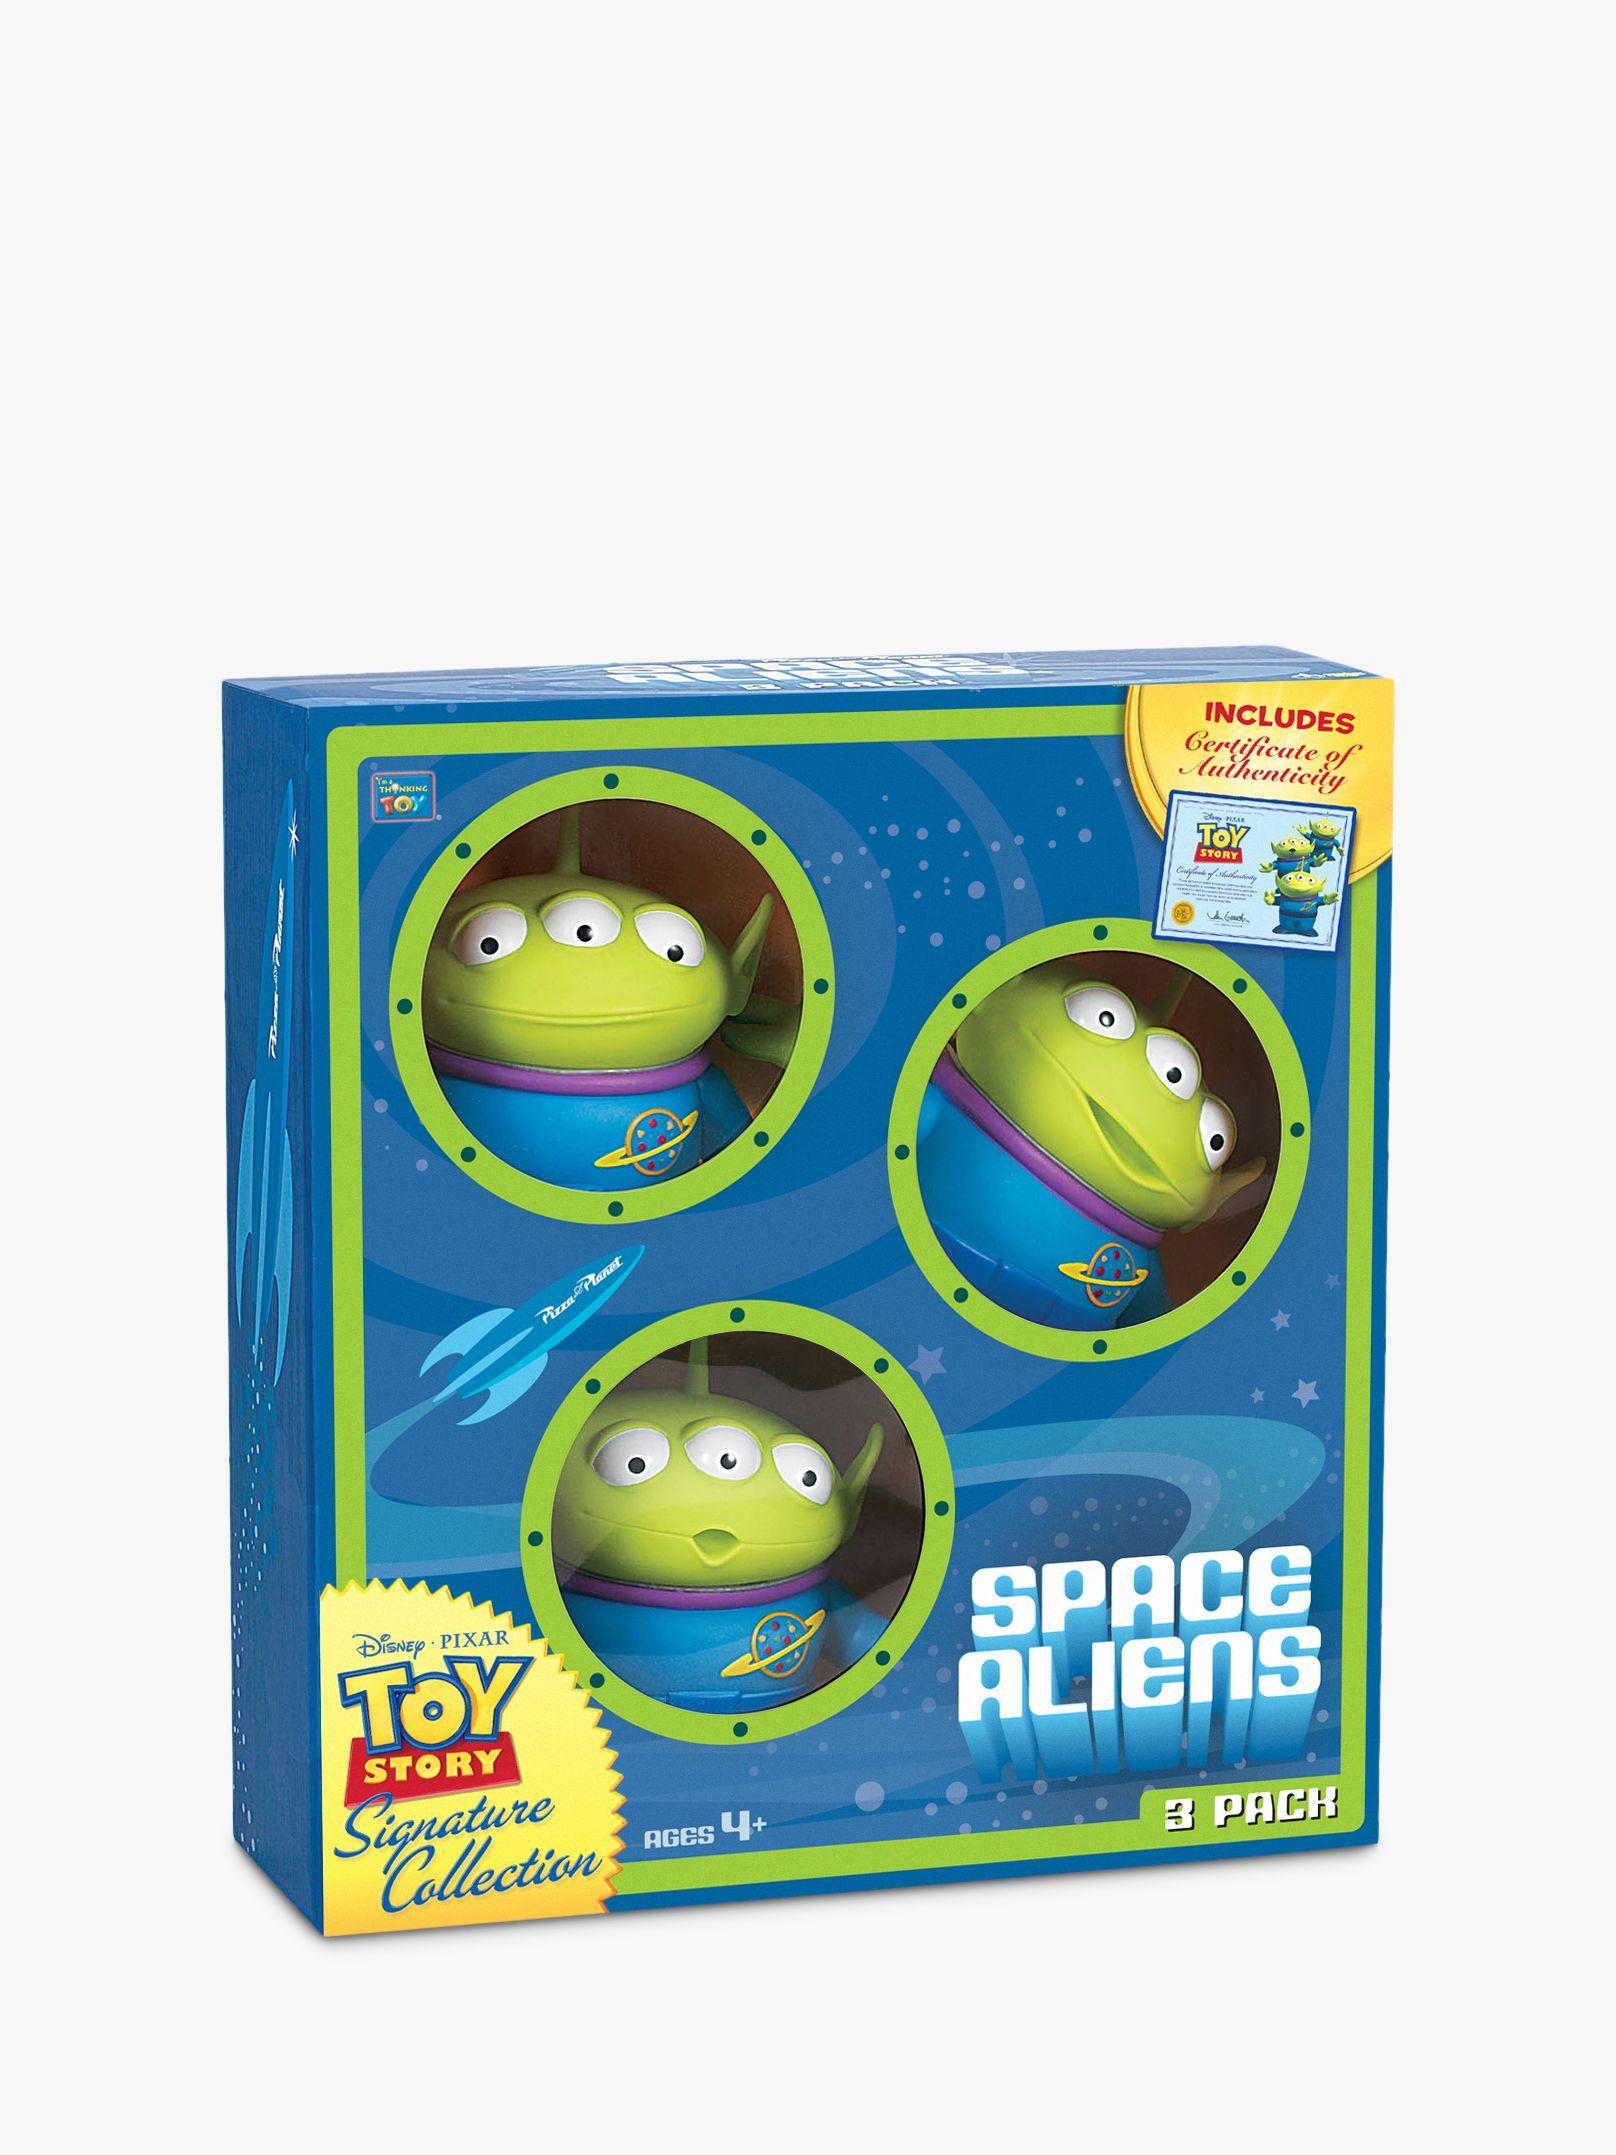 Disney Disney Toy Story 4 Space Aliens, Pack Of Three